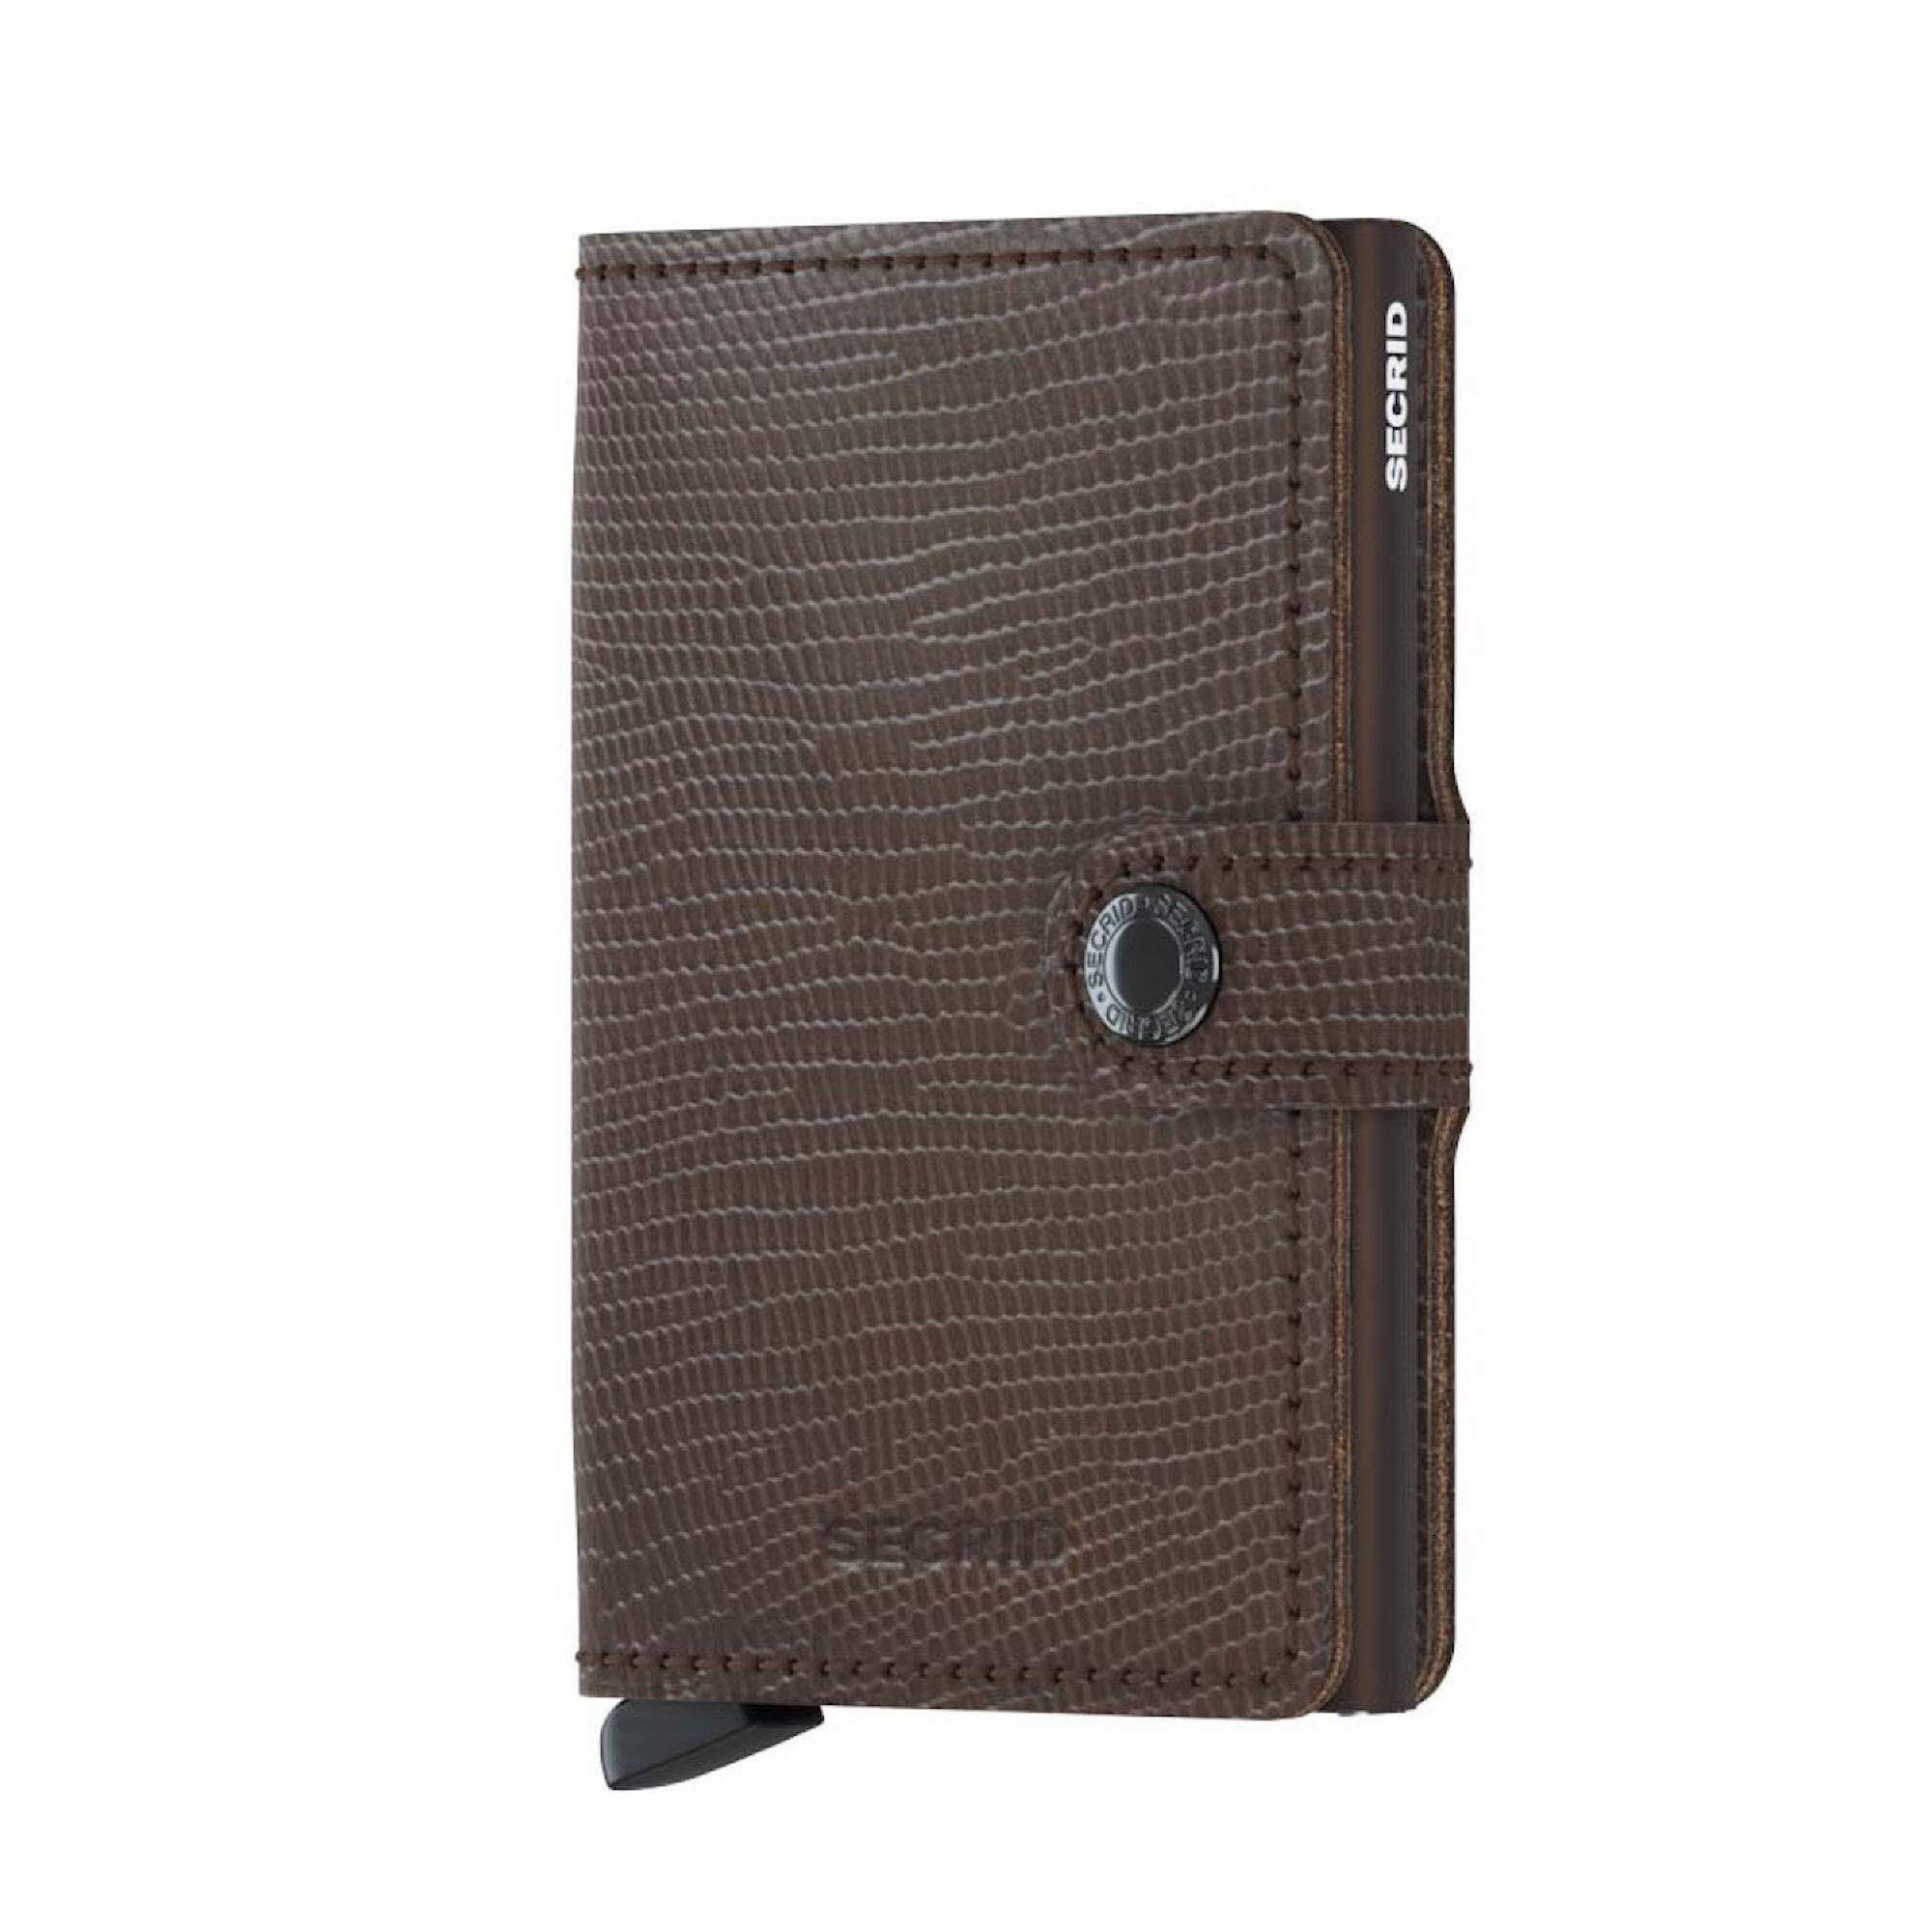 SECRID - Secrid Mini wallet Genuine Rango Leather RFID Safe Card Case for max 12 cards (Rango Brown Brown)